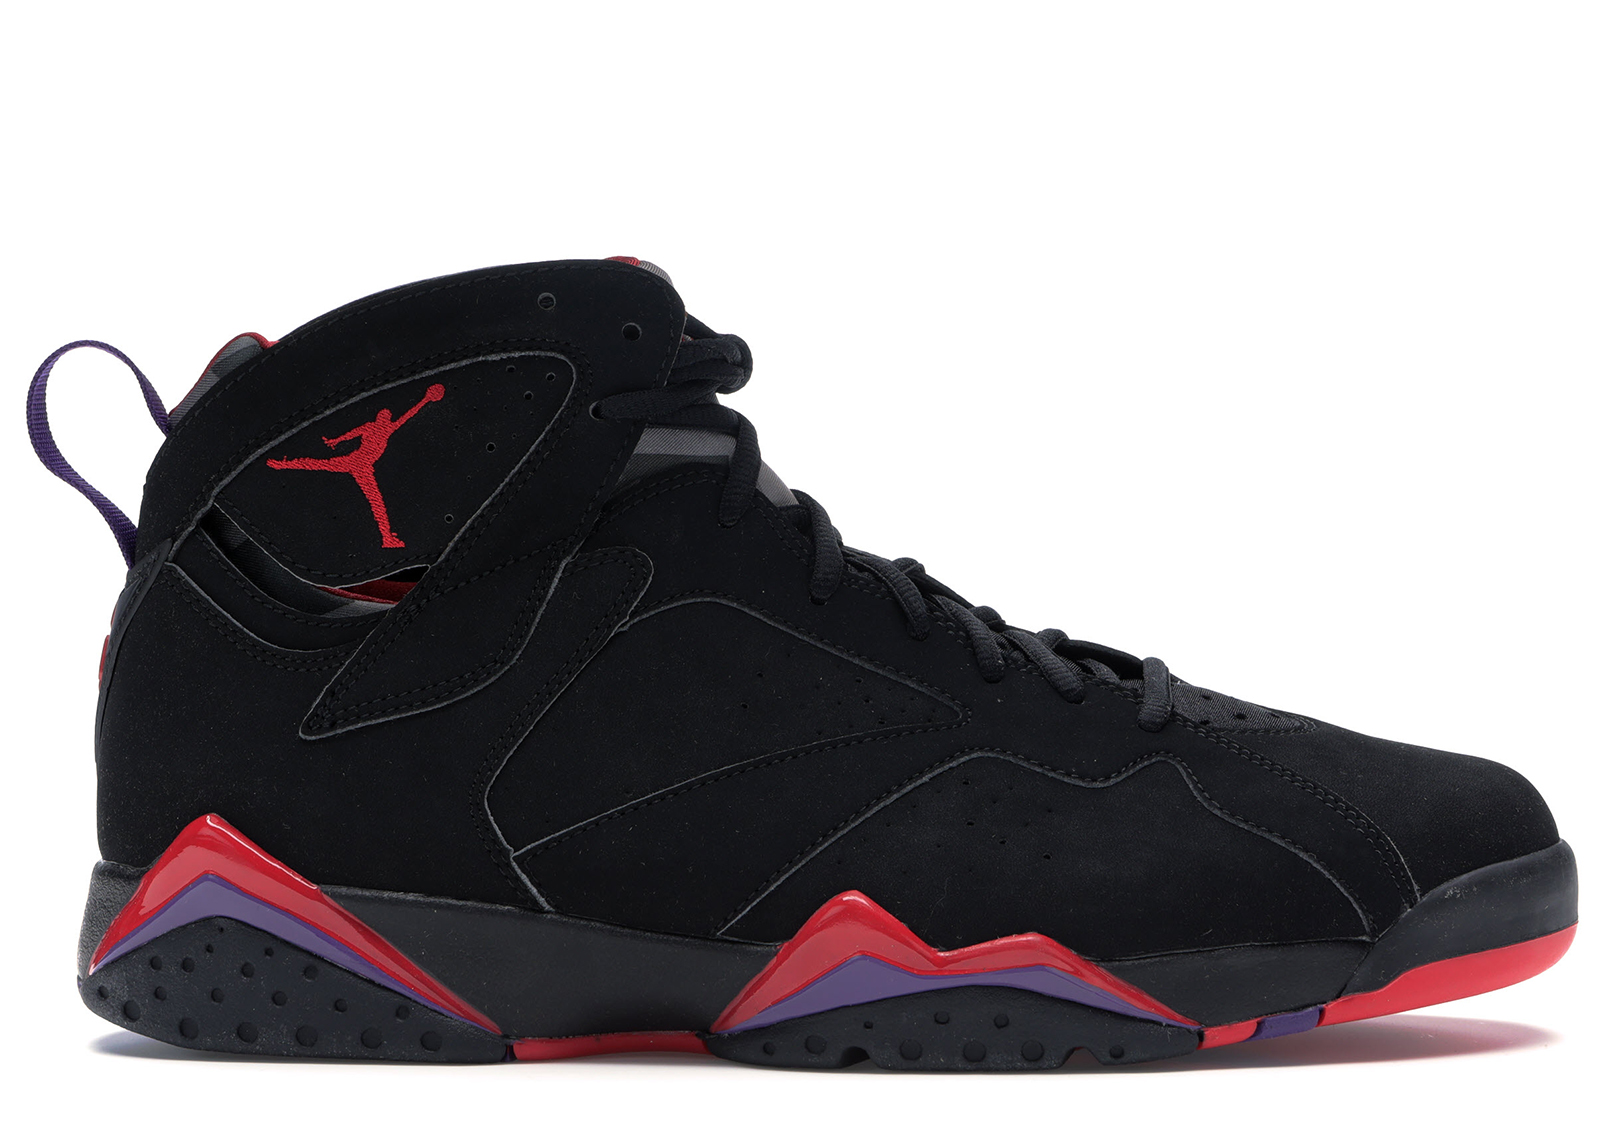 Jordan 7 Retro Raptors (2012) - 304775-018